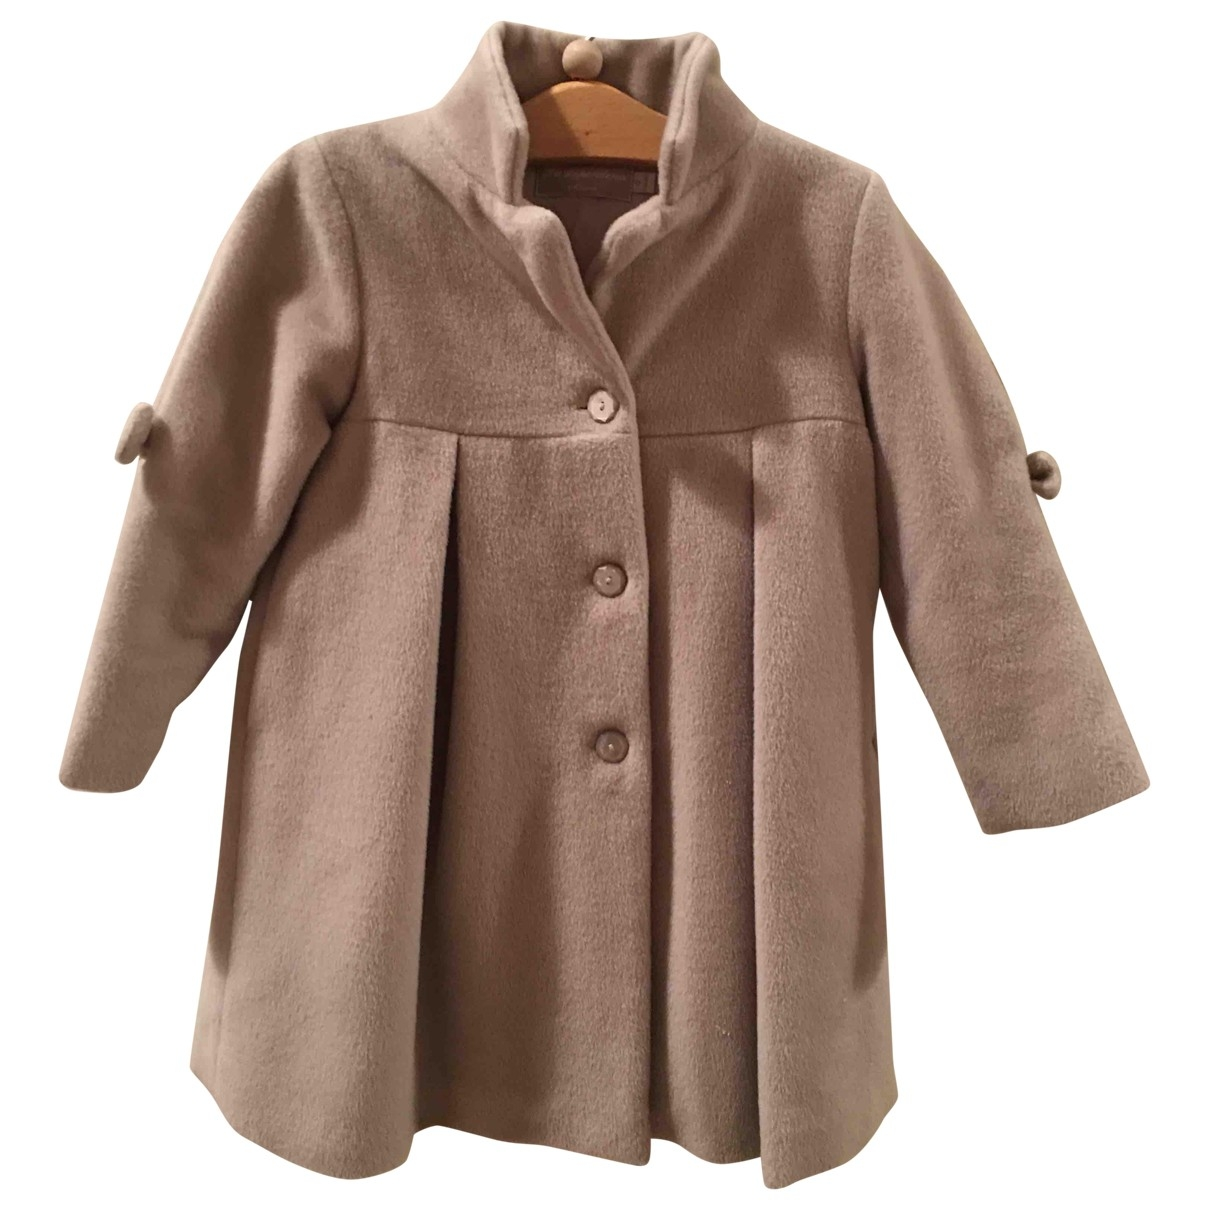 La Stupenderia \N Pink Wool jacket & coat for Kids 4 years - up to 102cm FR